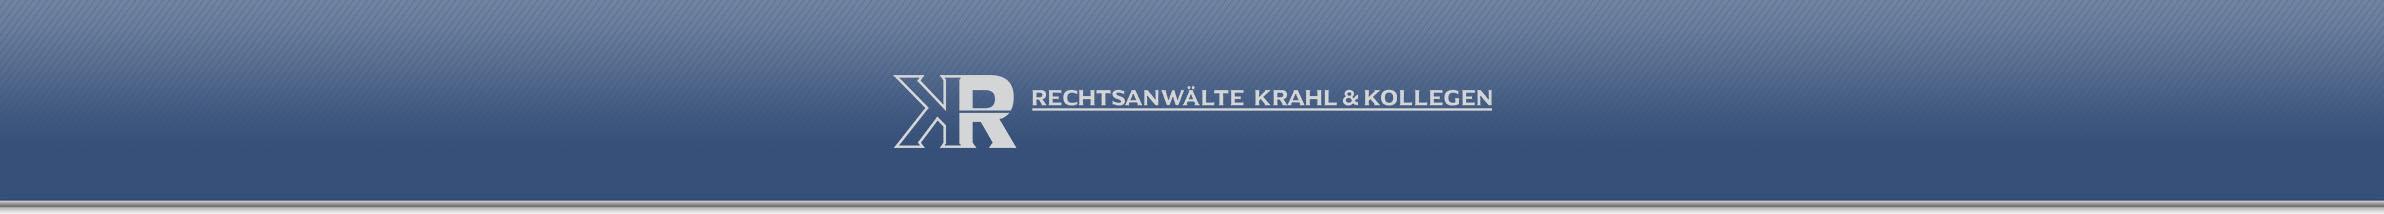 Krahl & Kollegen